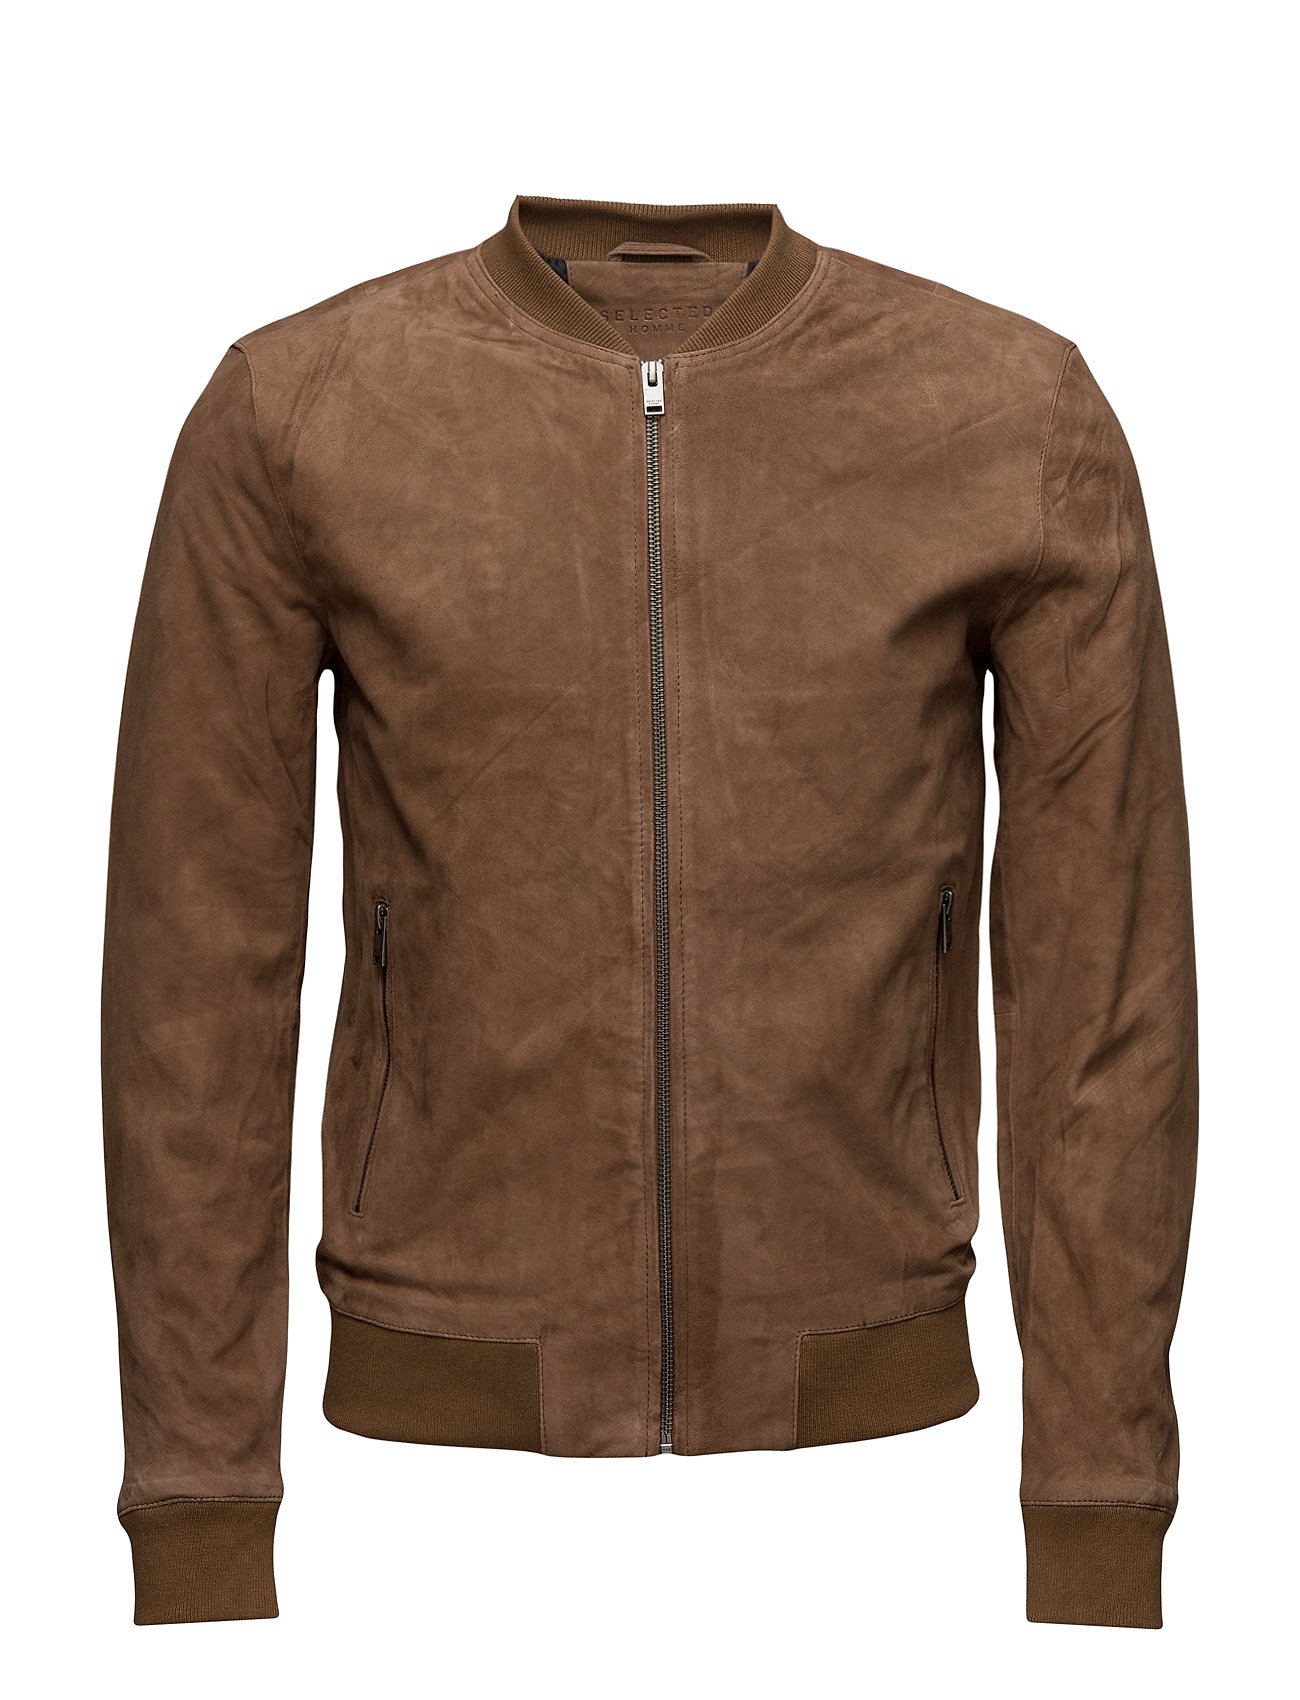 Shnmark Suede Bomber Jacket Noos Selected Homme Jackets